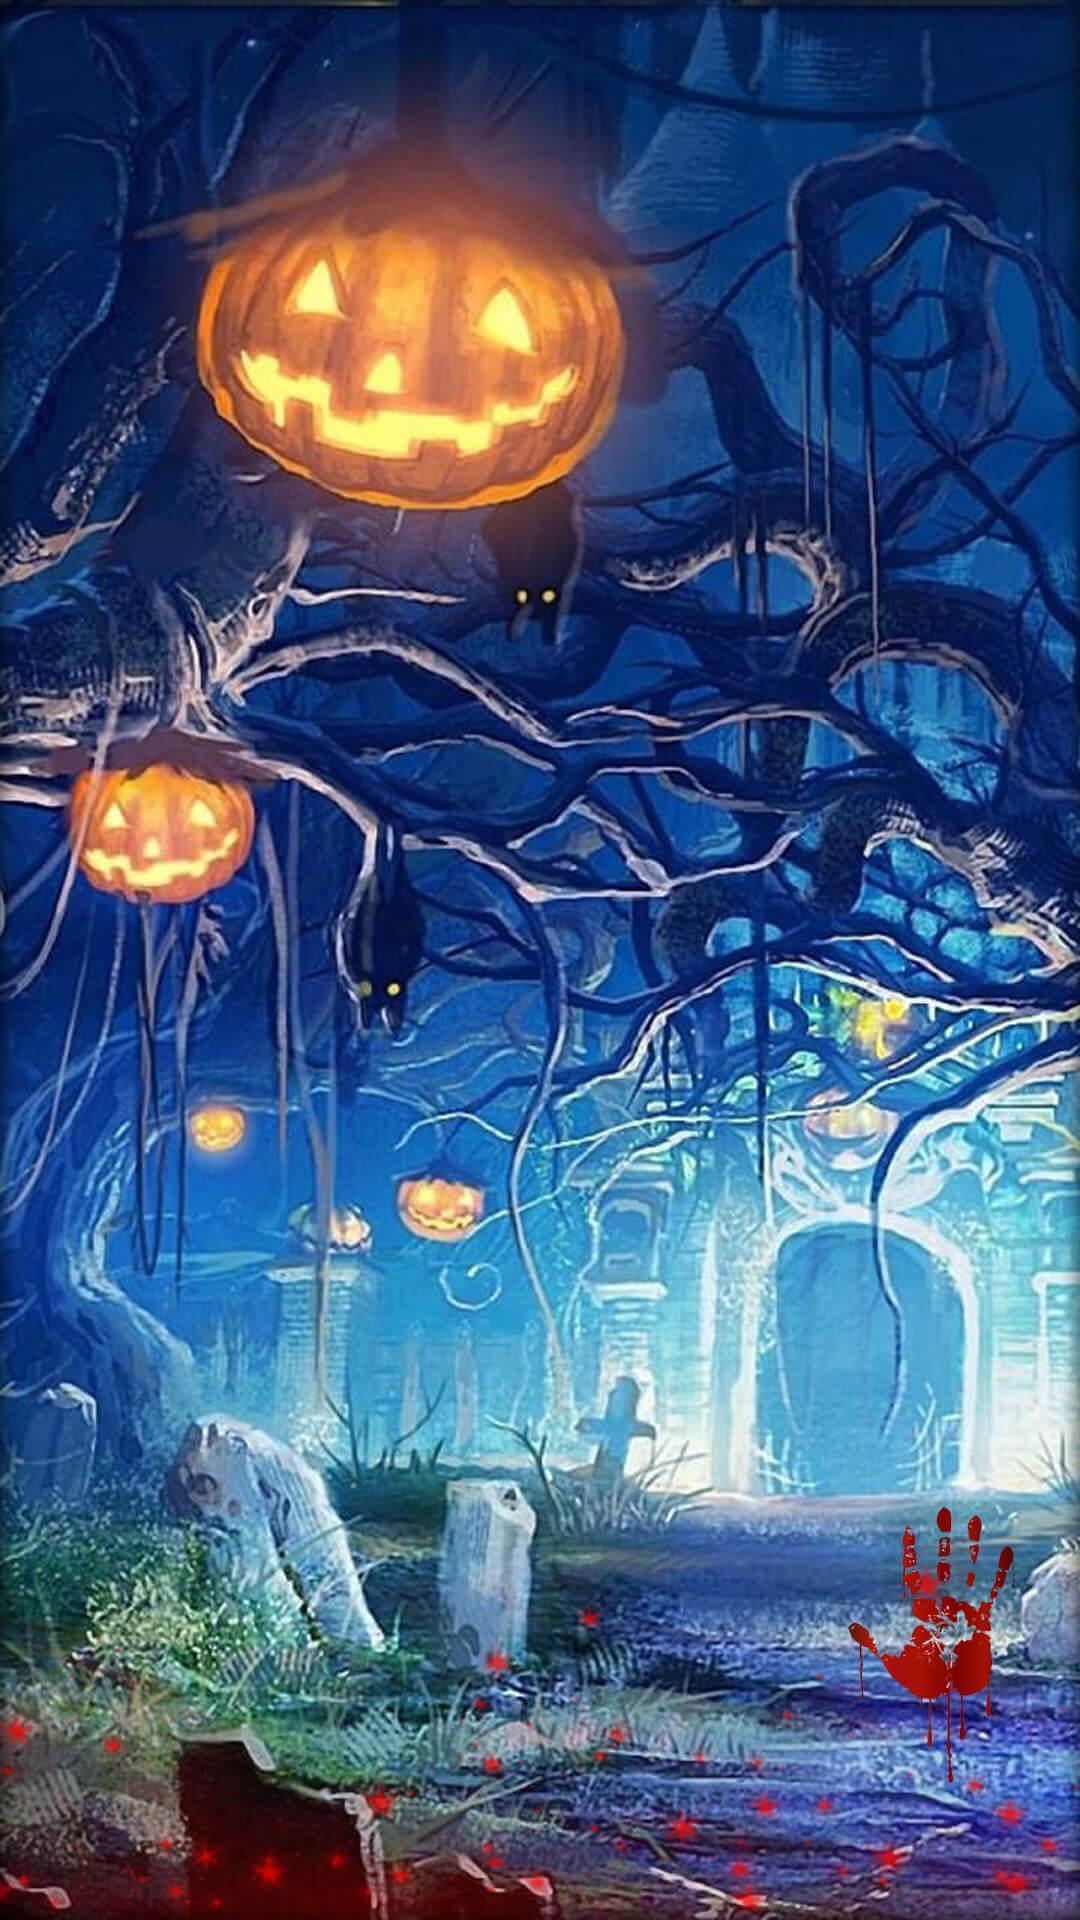 Scary Live Wallpaper - 1080x1920 - Download HD Wallpaper ...